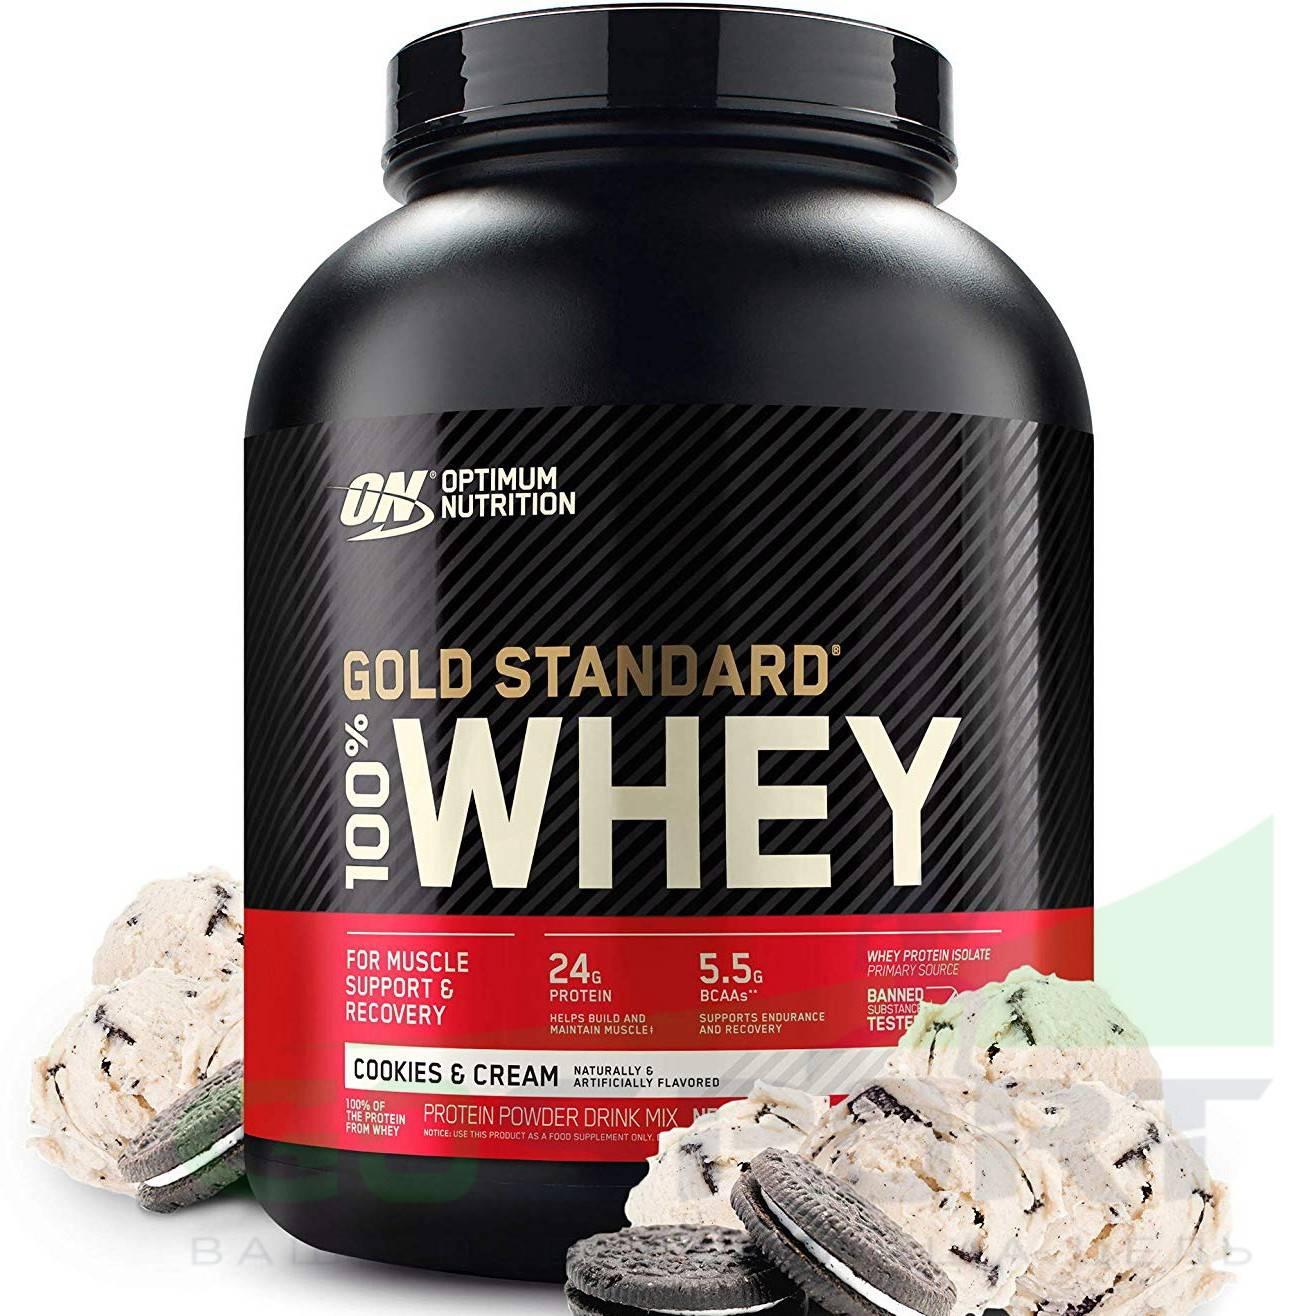 100% whey protein gold standard от optimum nutrition, как принимать, состав